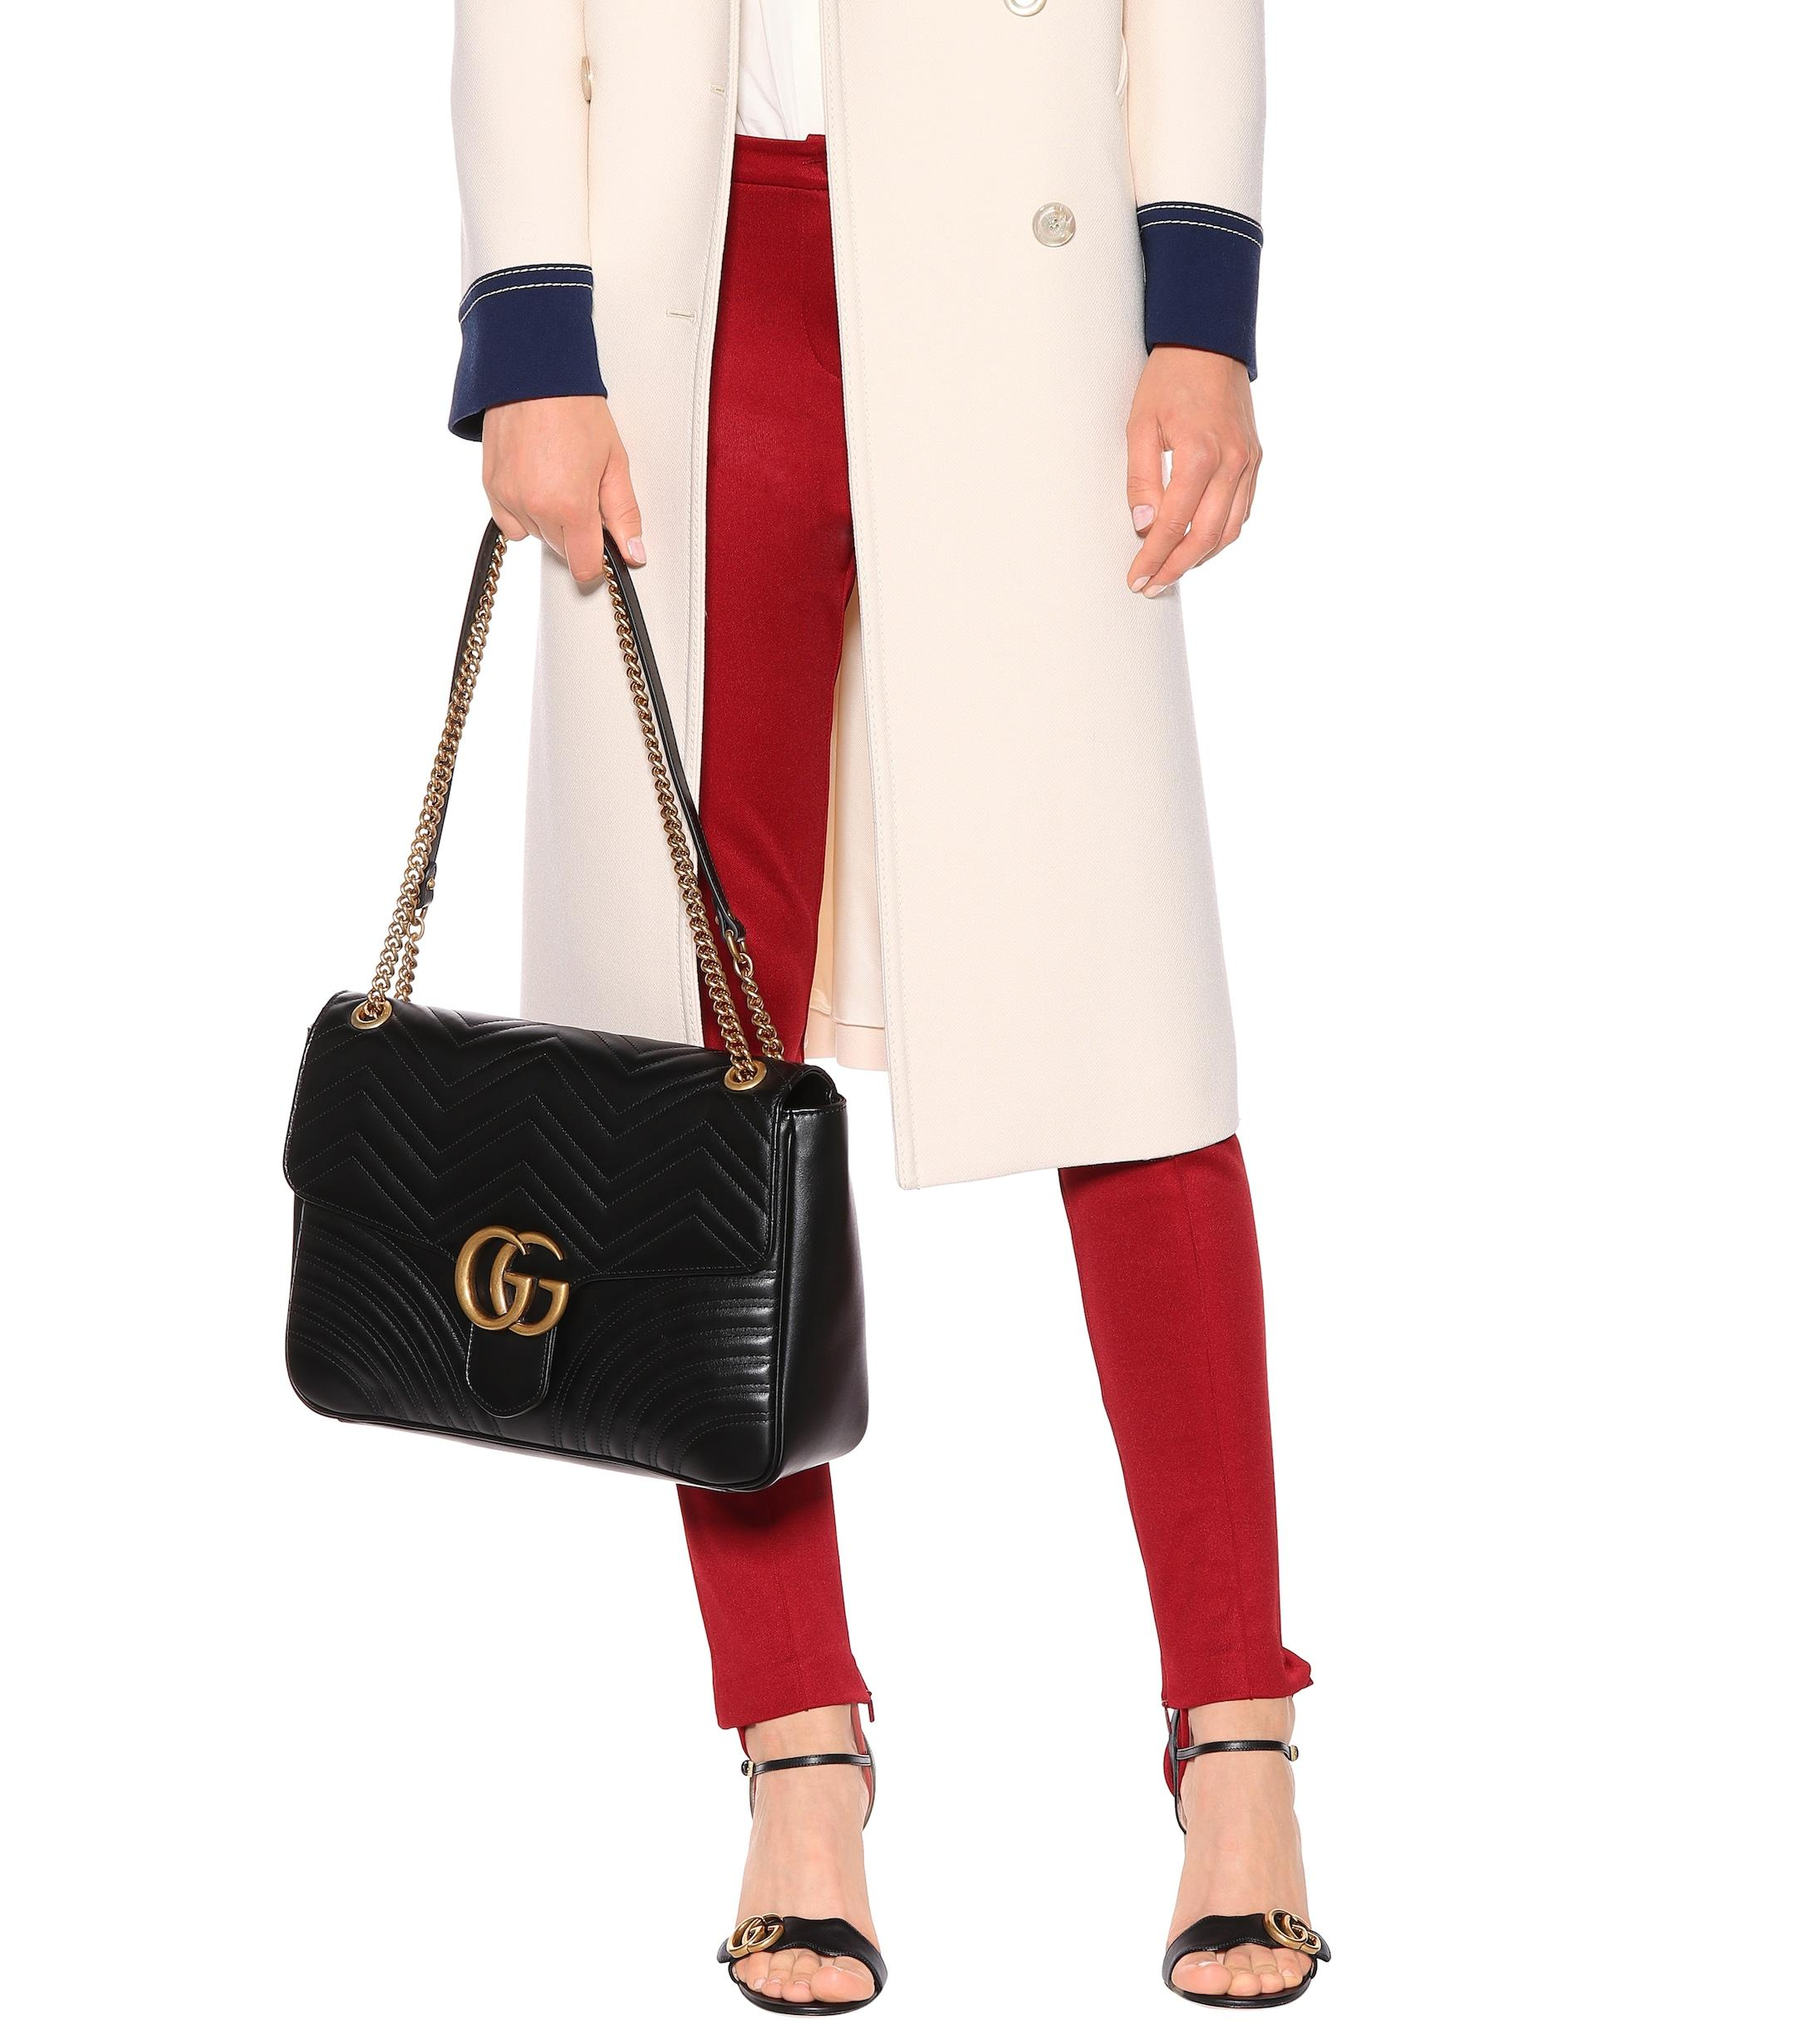 dfc2c9ba19f Gucci - Black GG Marmont Large Shoulder Bag - Lyst. View fullscreen